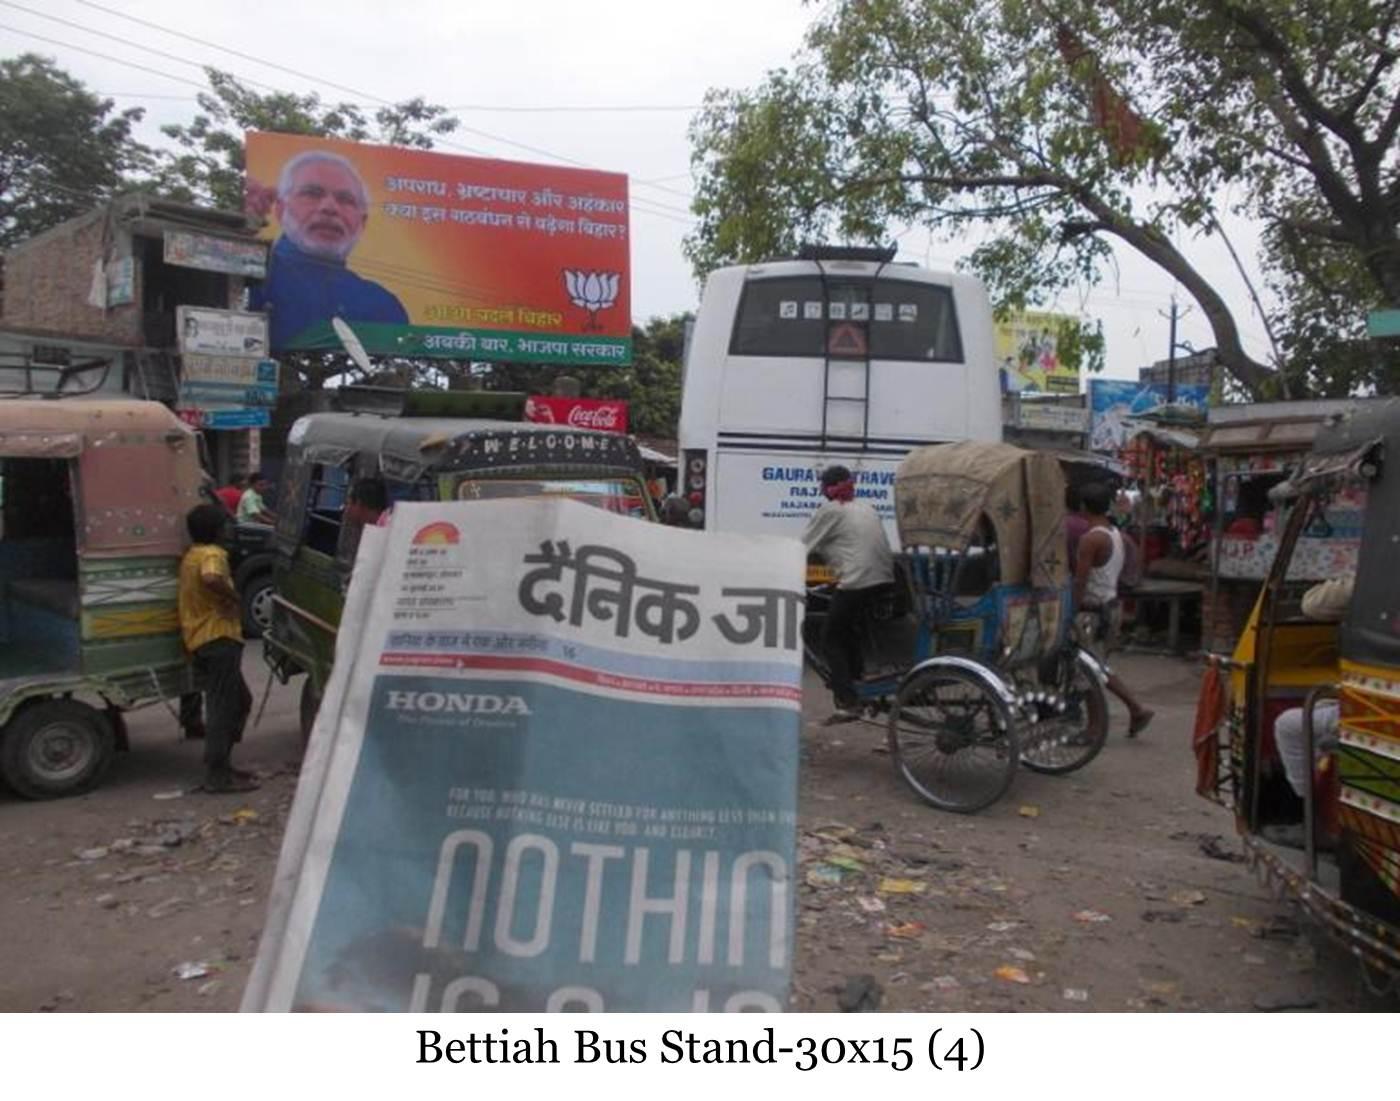 Bus Stand, Bettiah